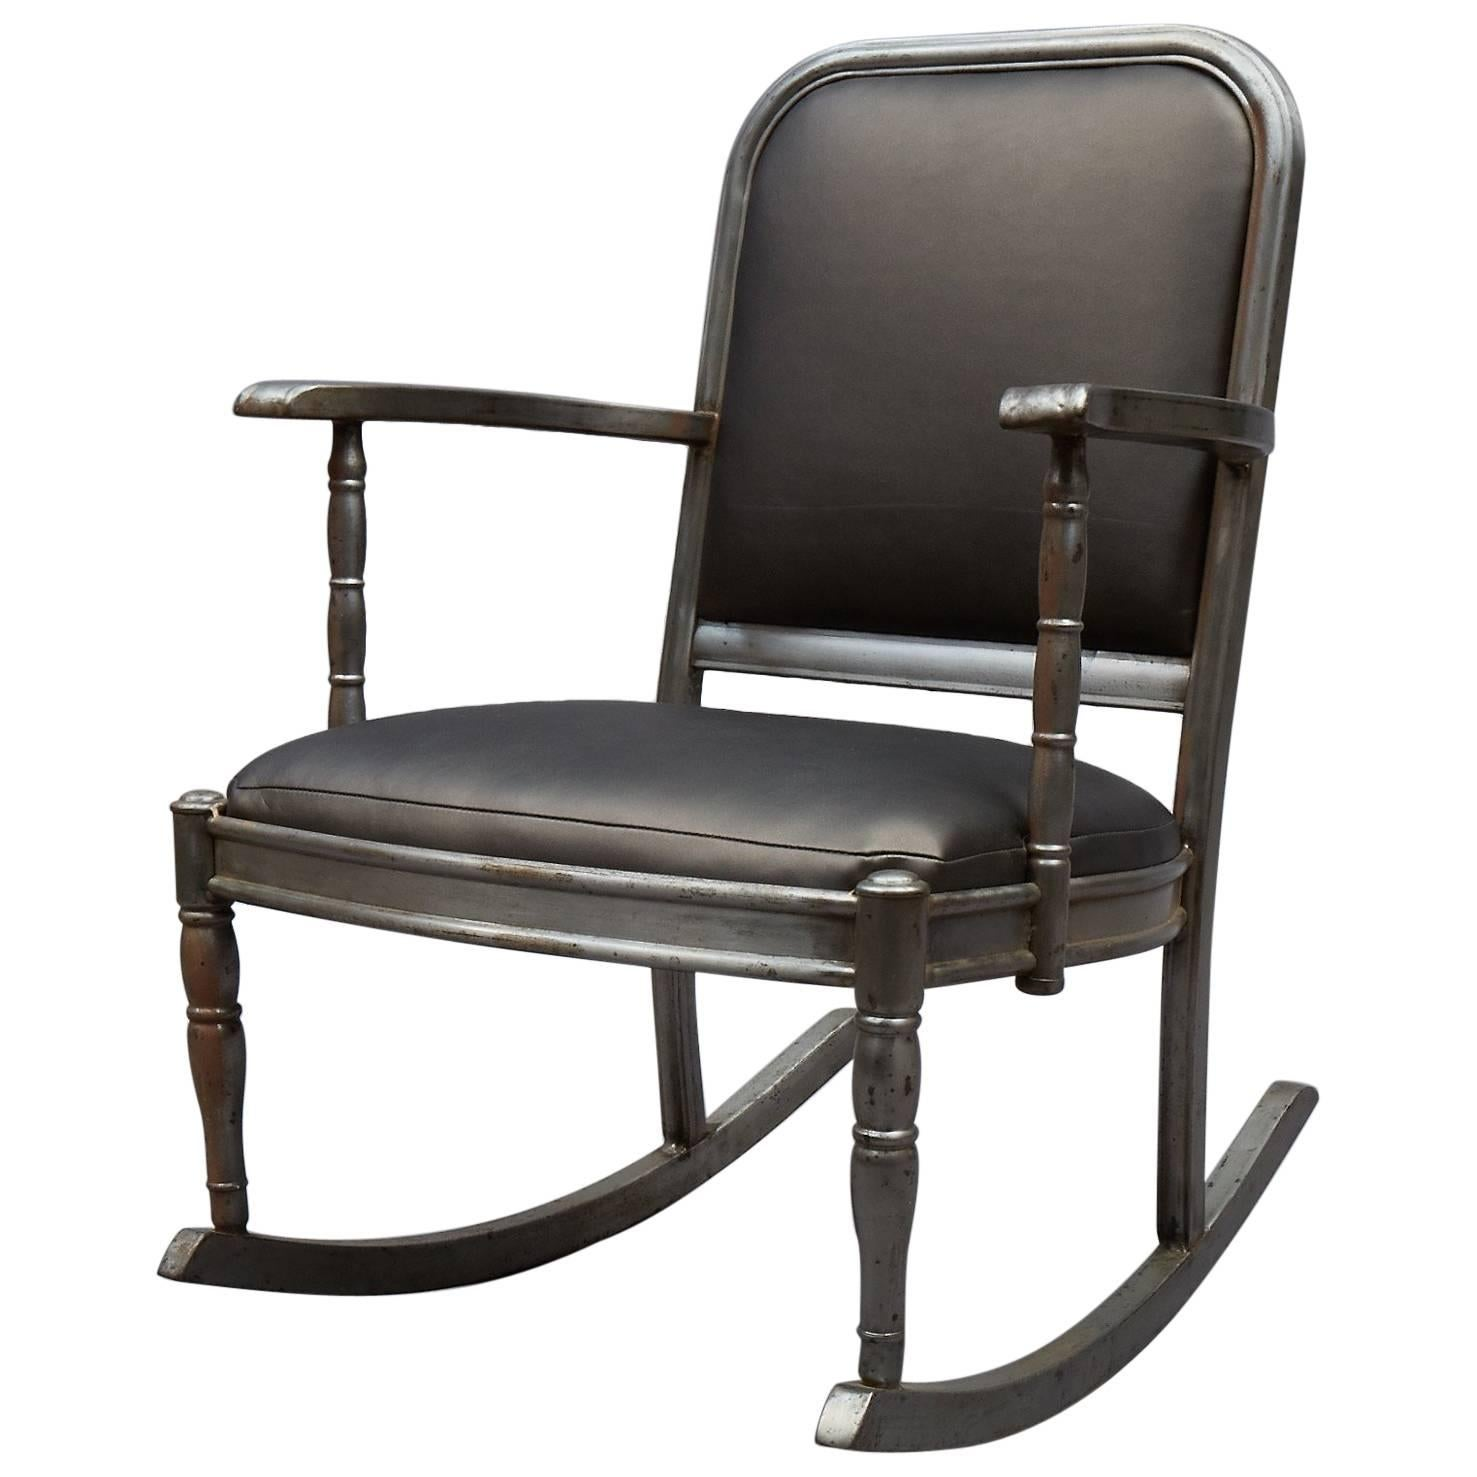 Simmons Brushed Steel And Gunmetal Vinyl Rocking Chair